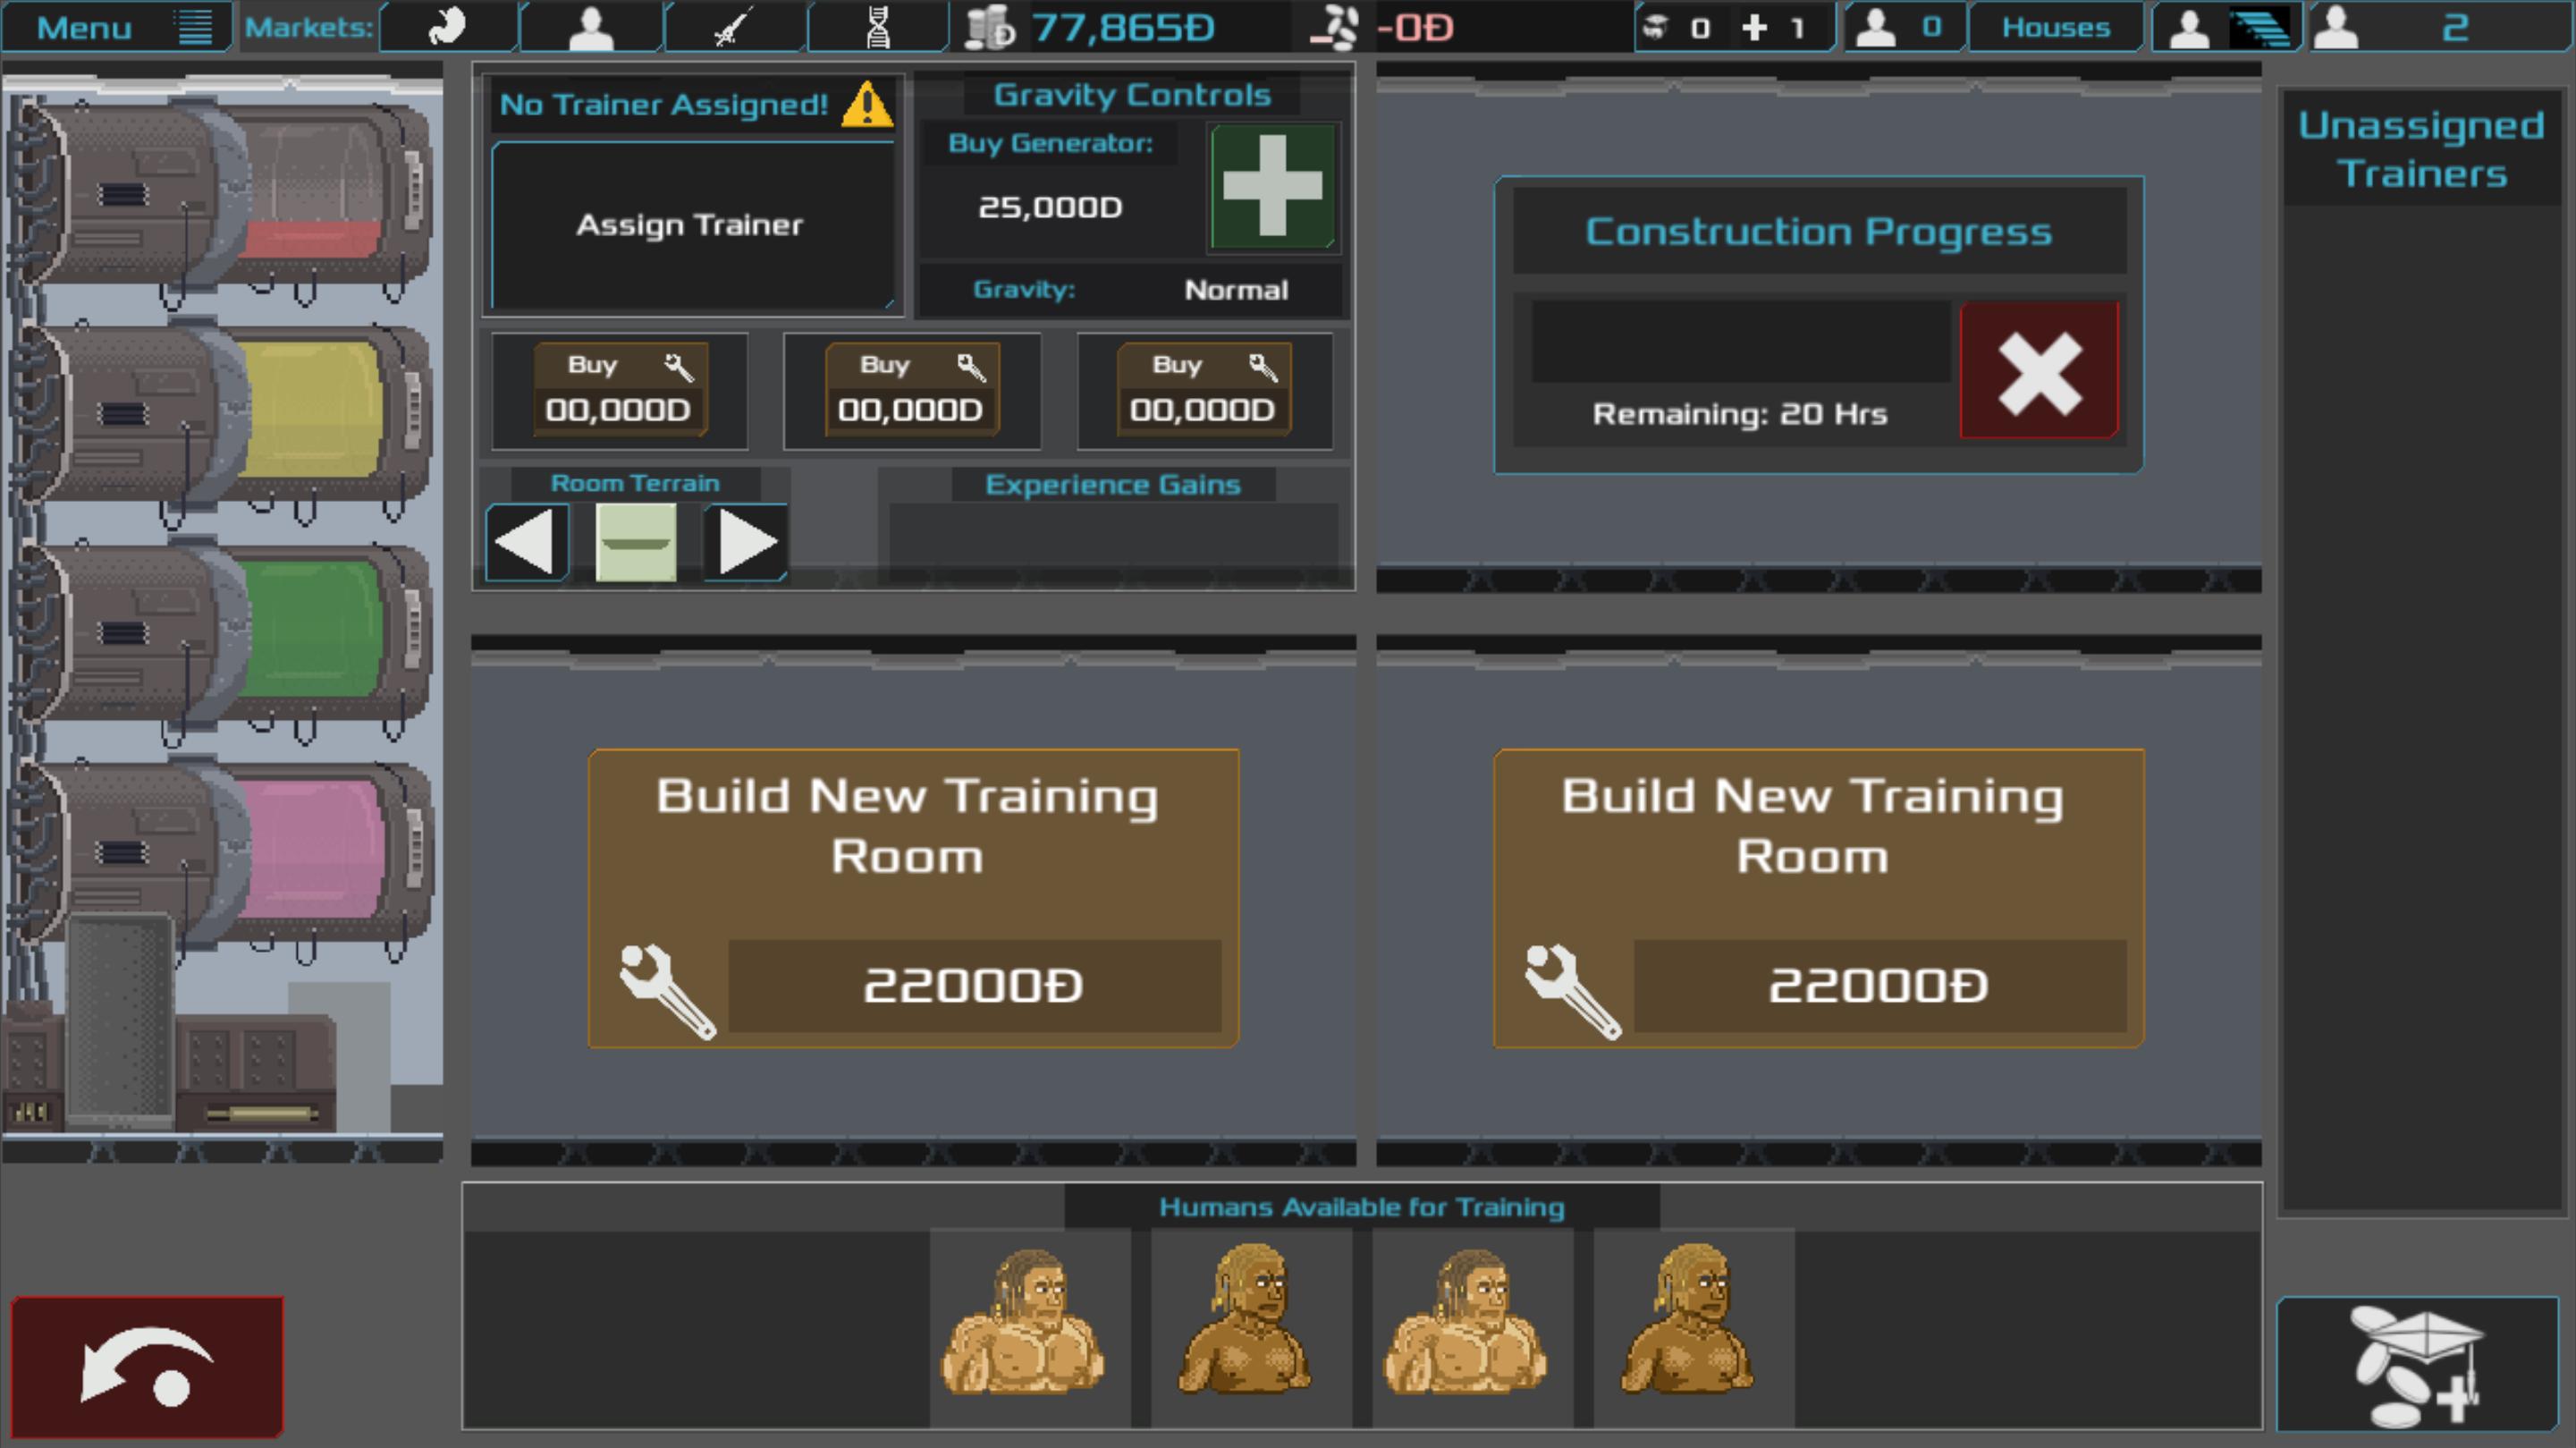 Training UI